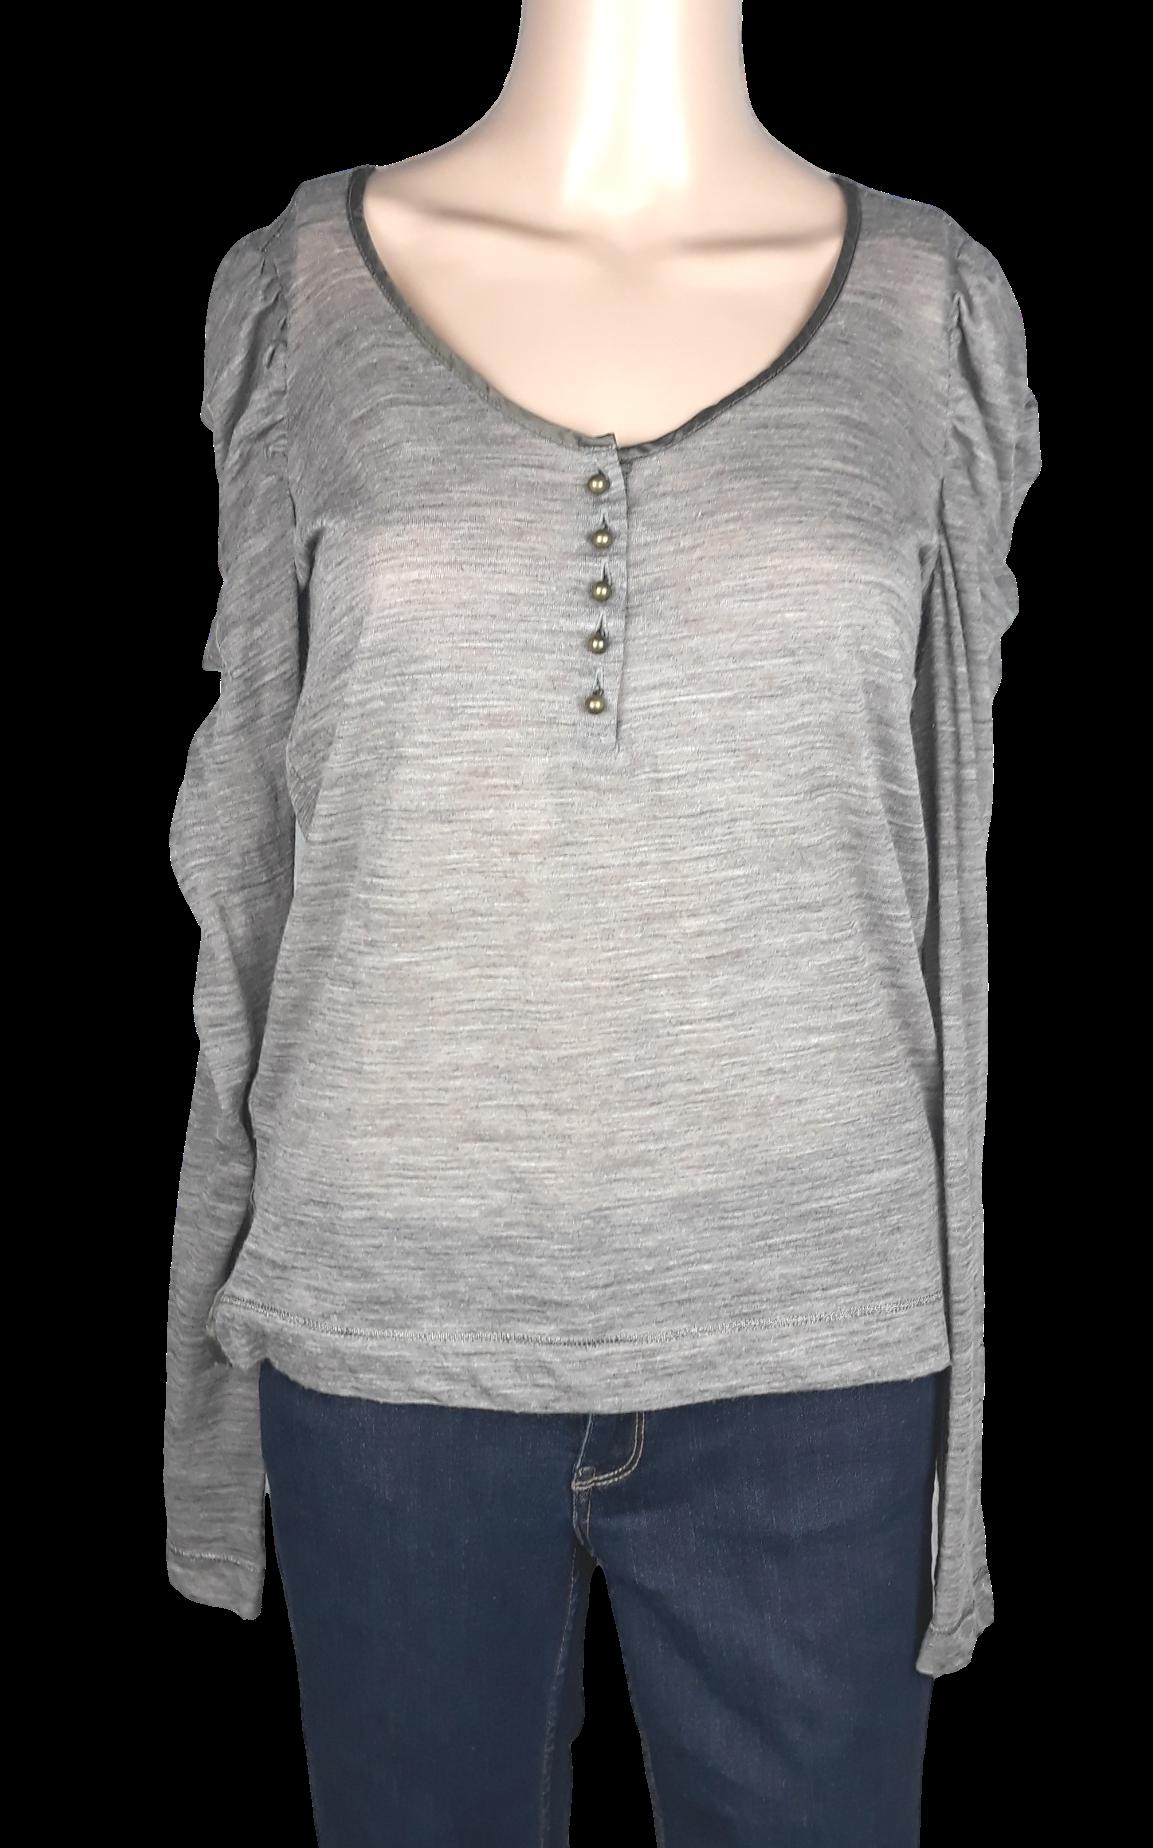 T-shirt IKKS- Taille S